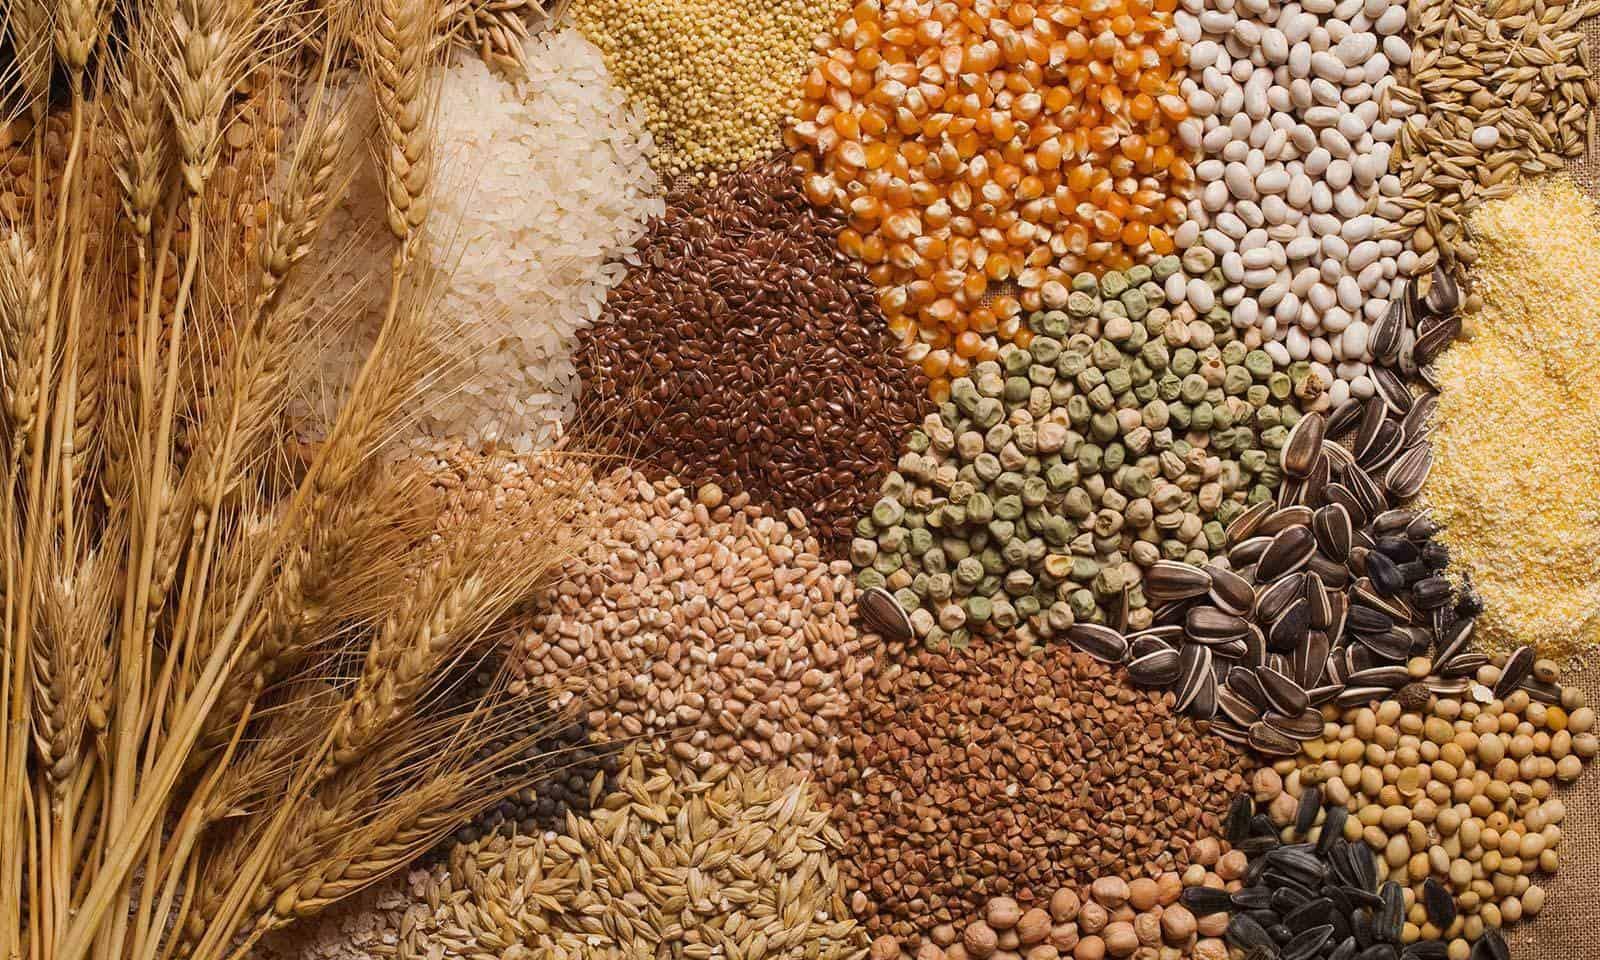 PunjabKesari, चने, जौ, बाजरा, अरहर, मूंग